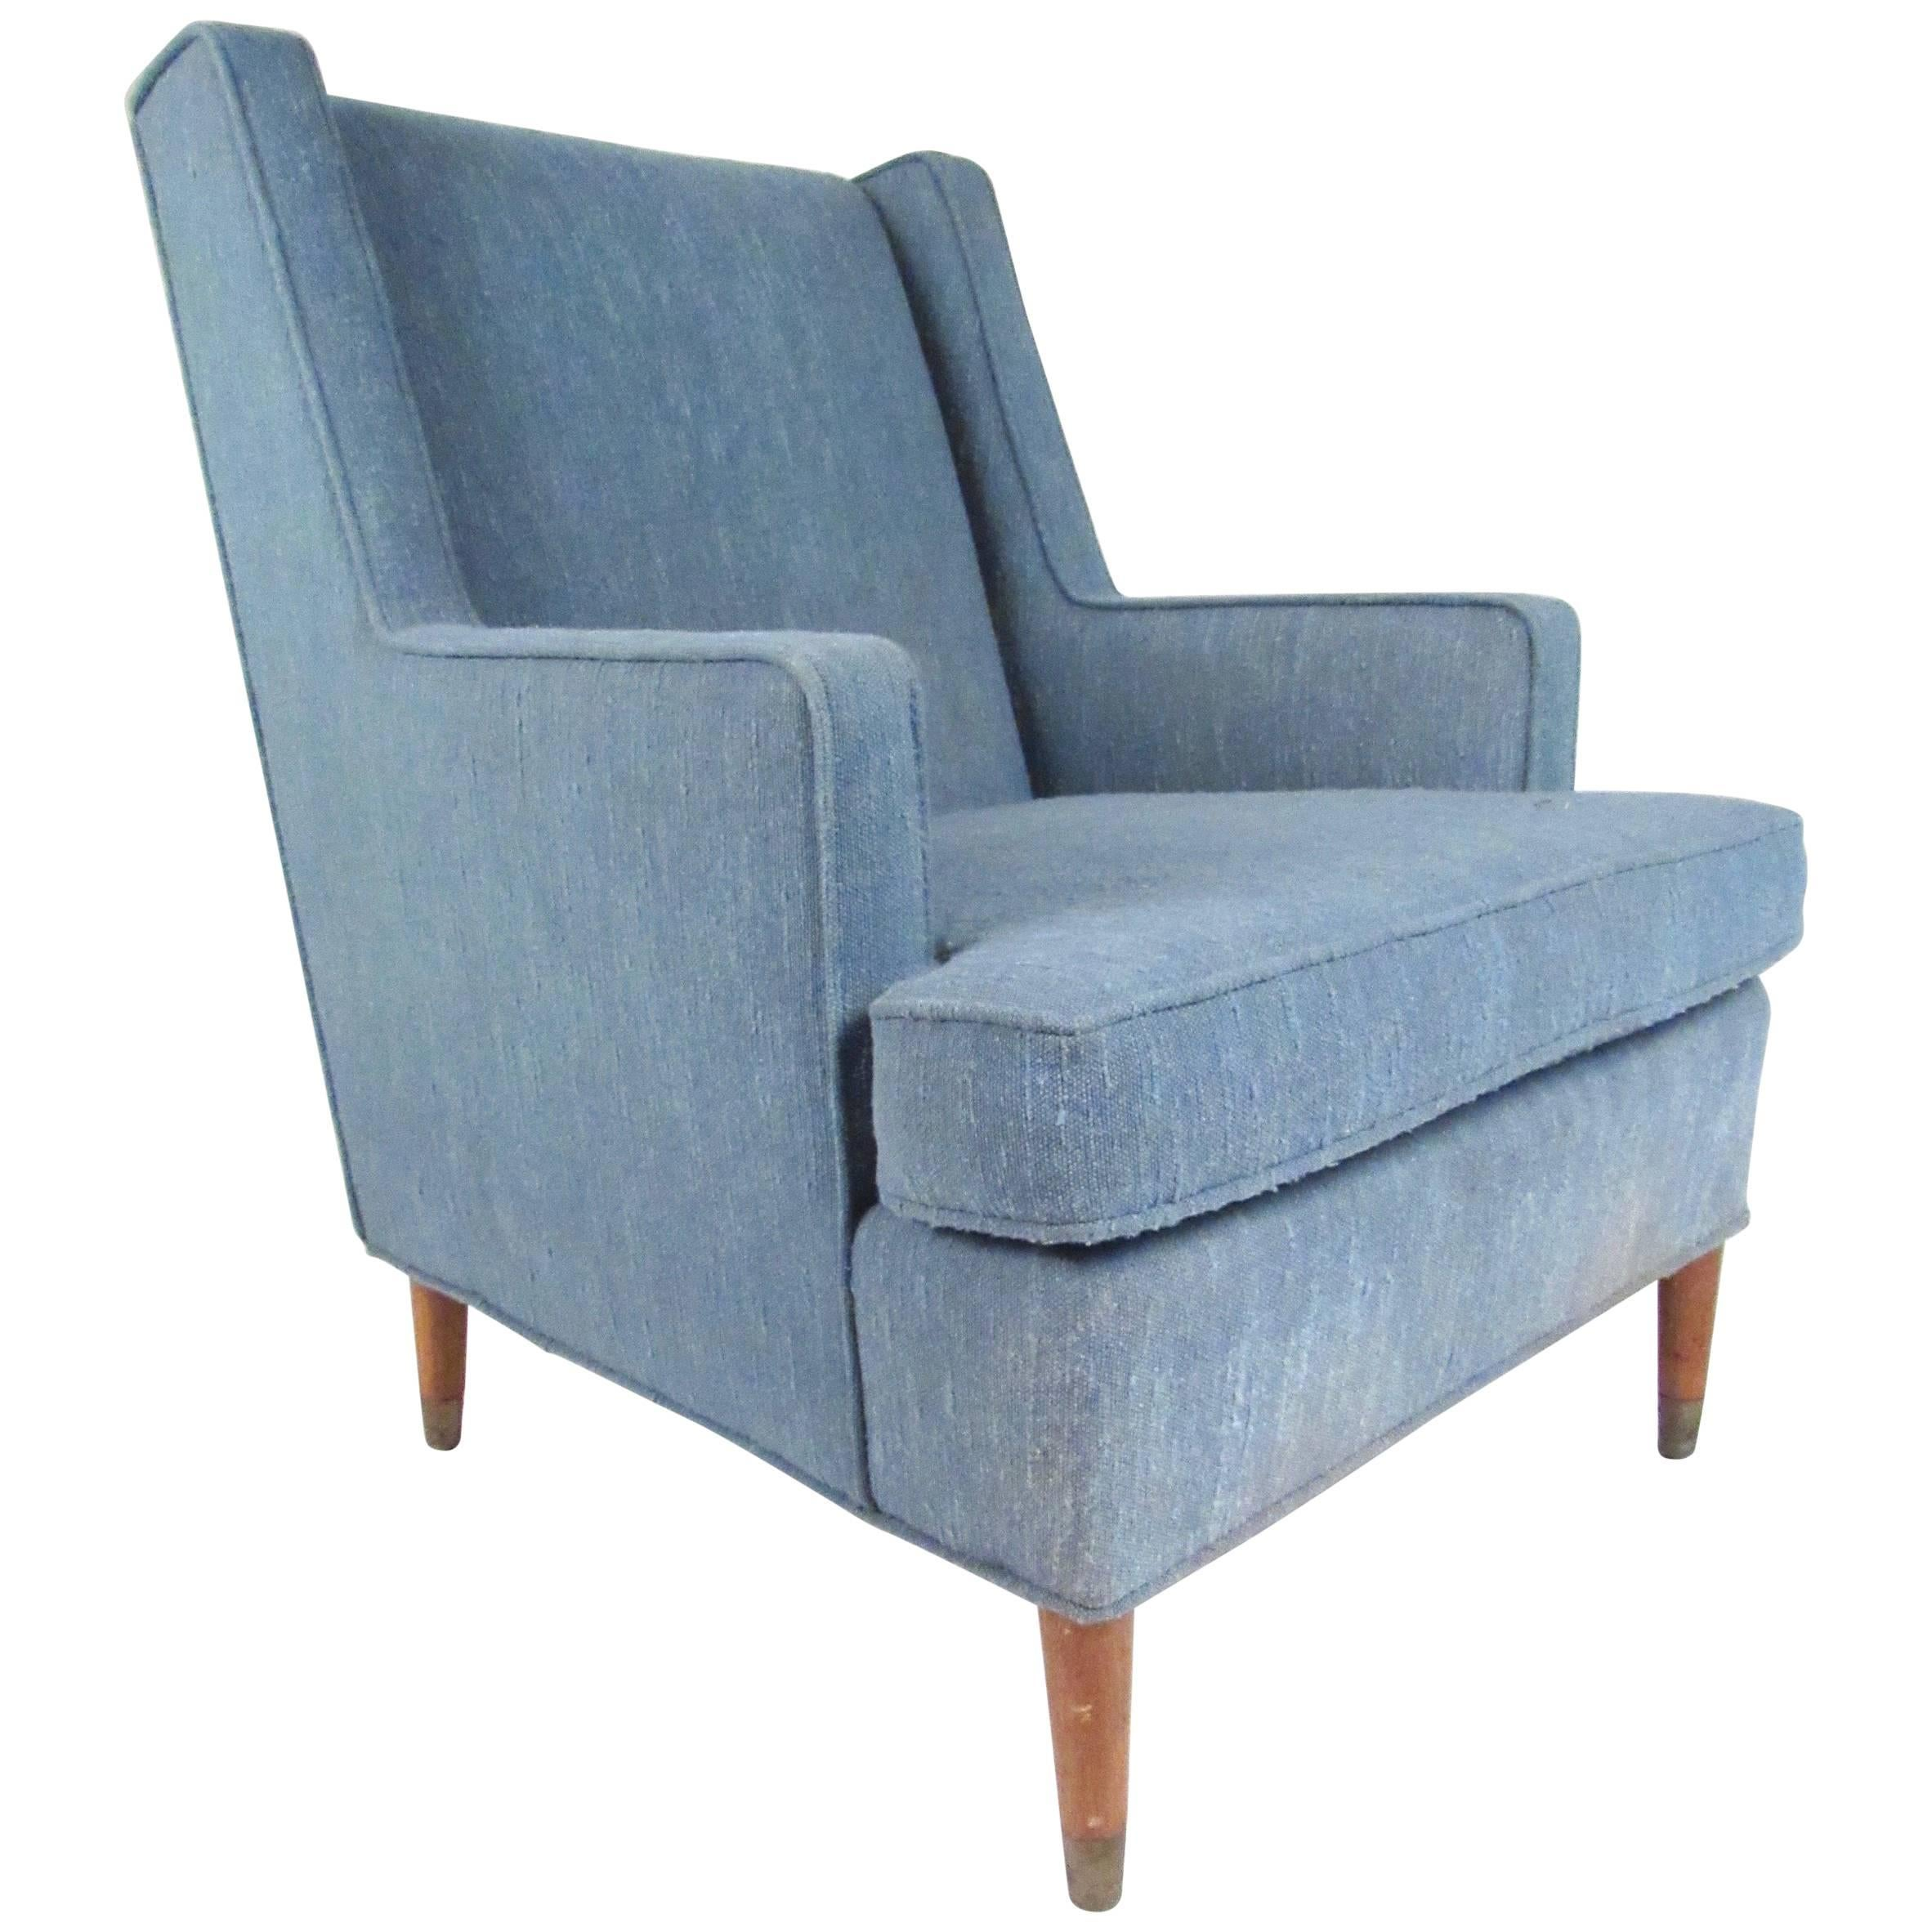 Vintage Modern Upholstered Lounge Chair